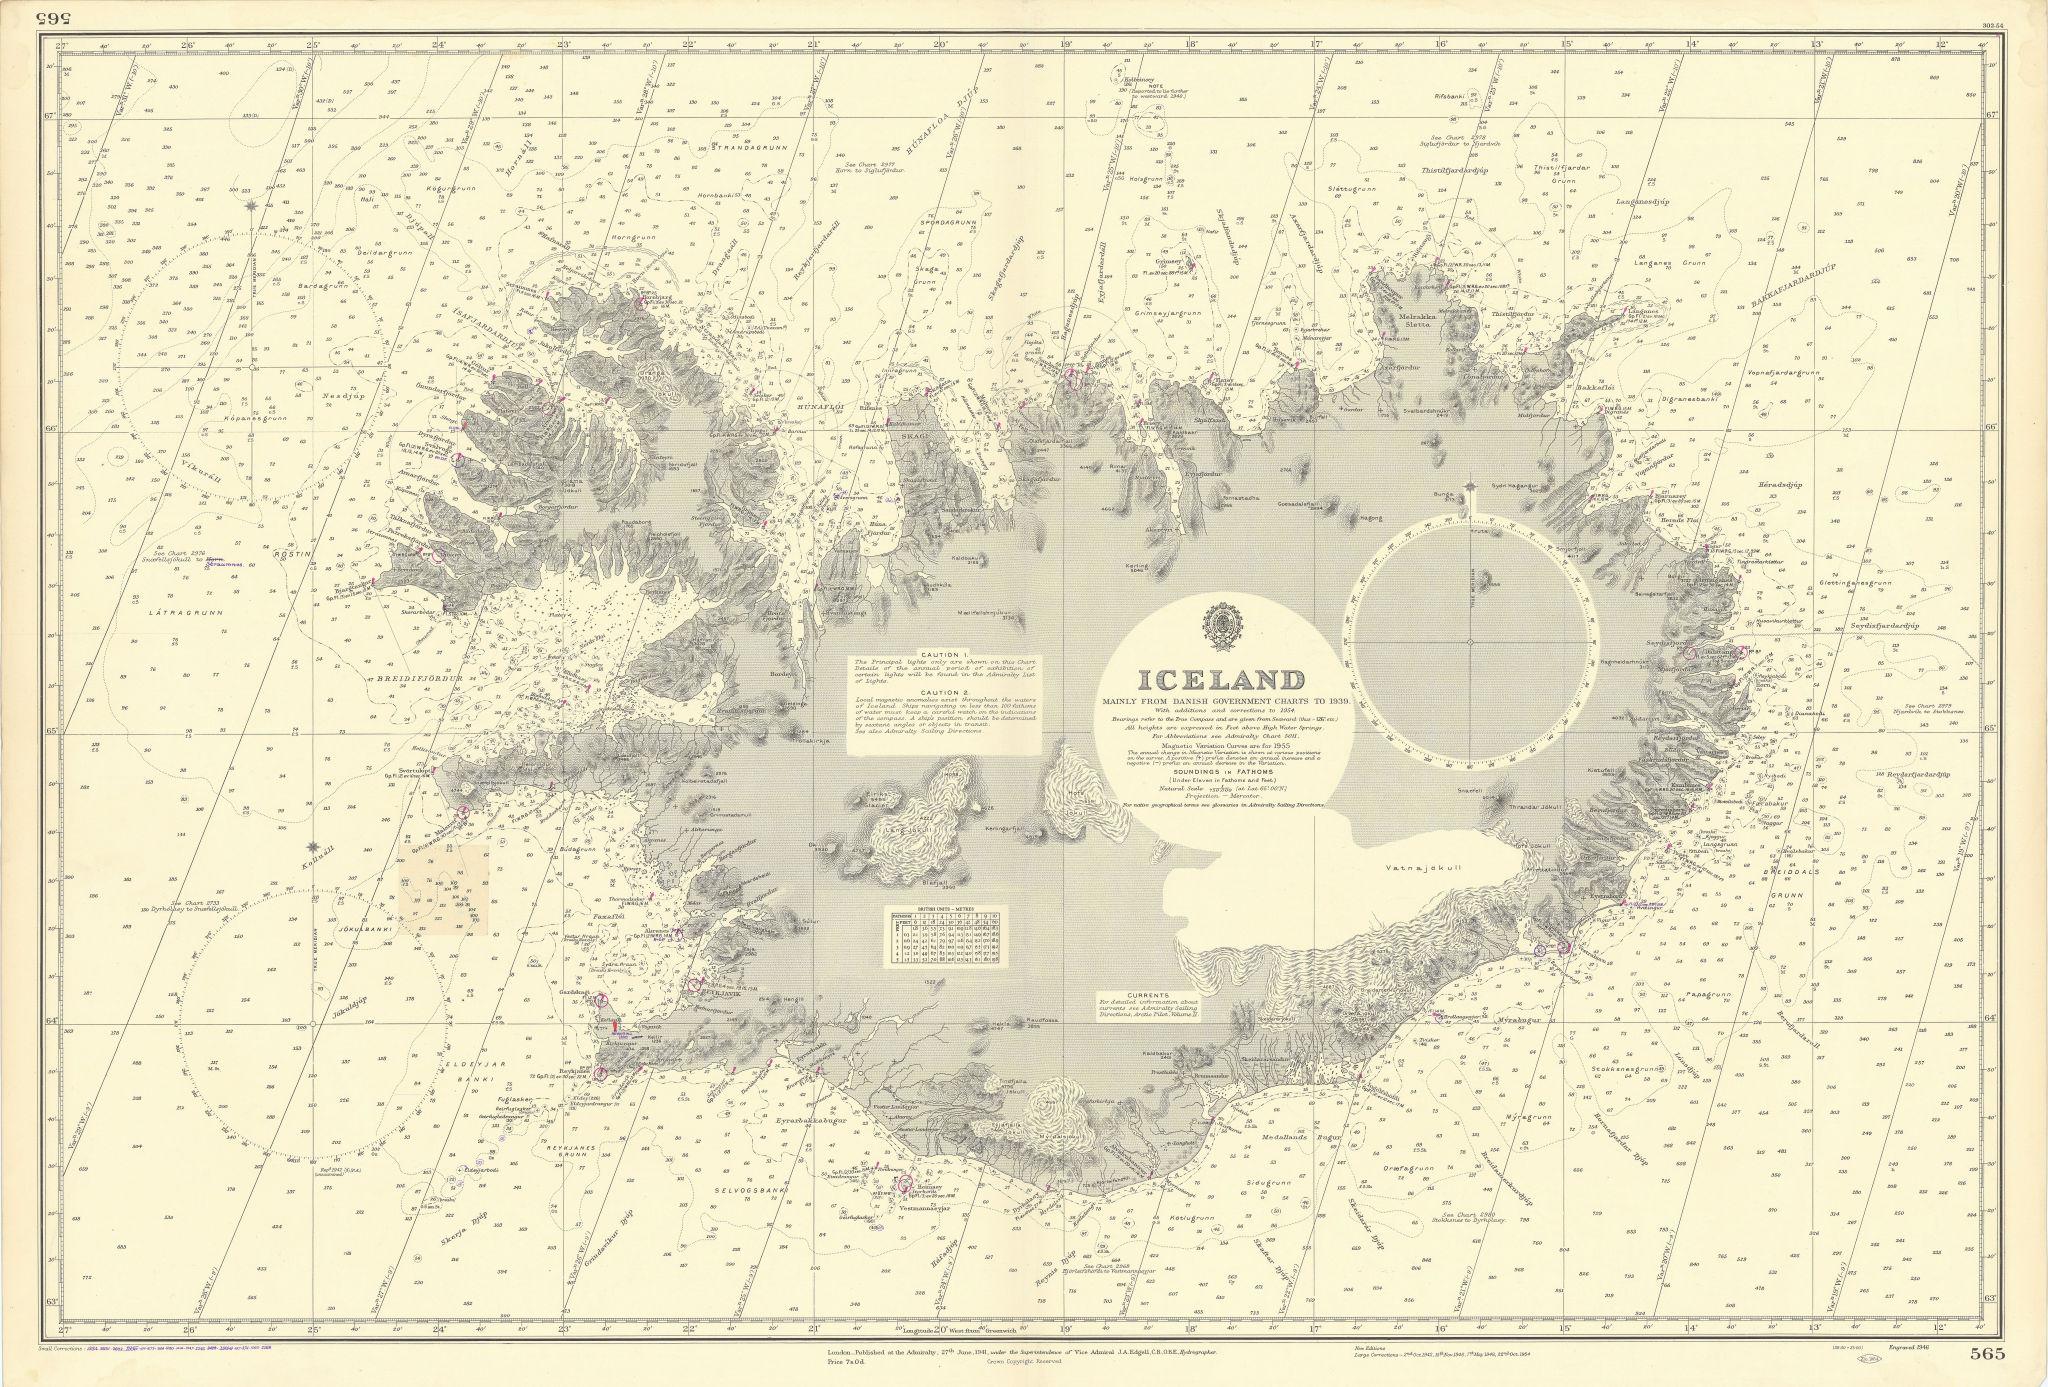 Iceland. Norwegian Sea. North Atlantic. ADMIRALTY sea chart 1941 (1956) map